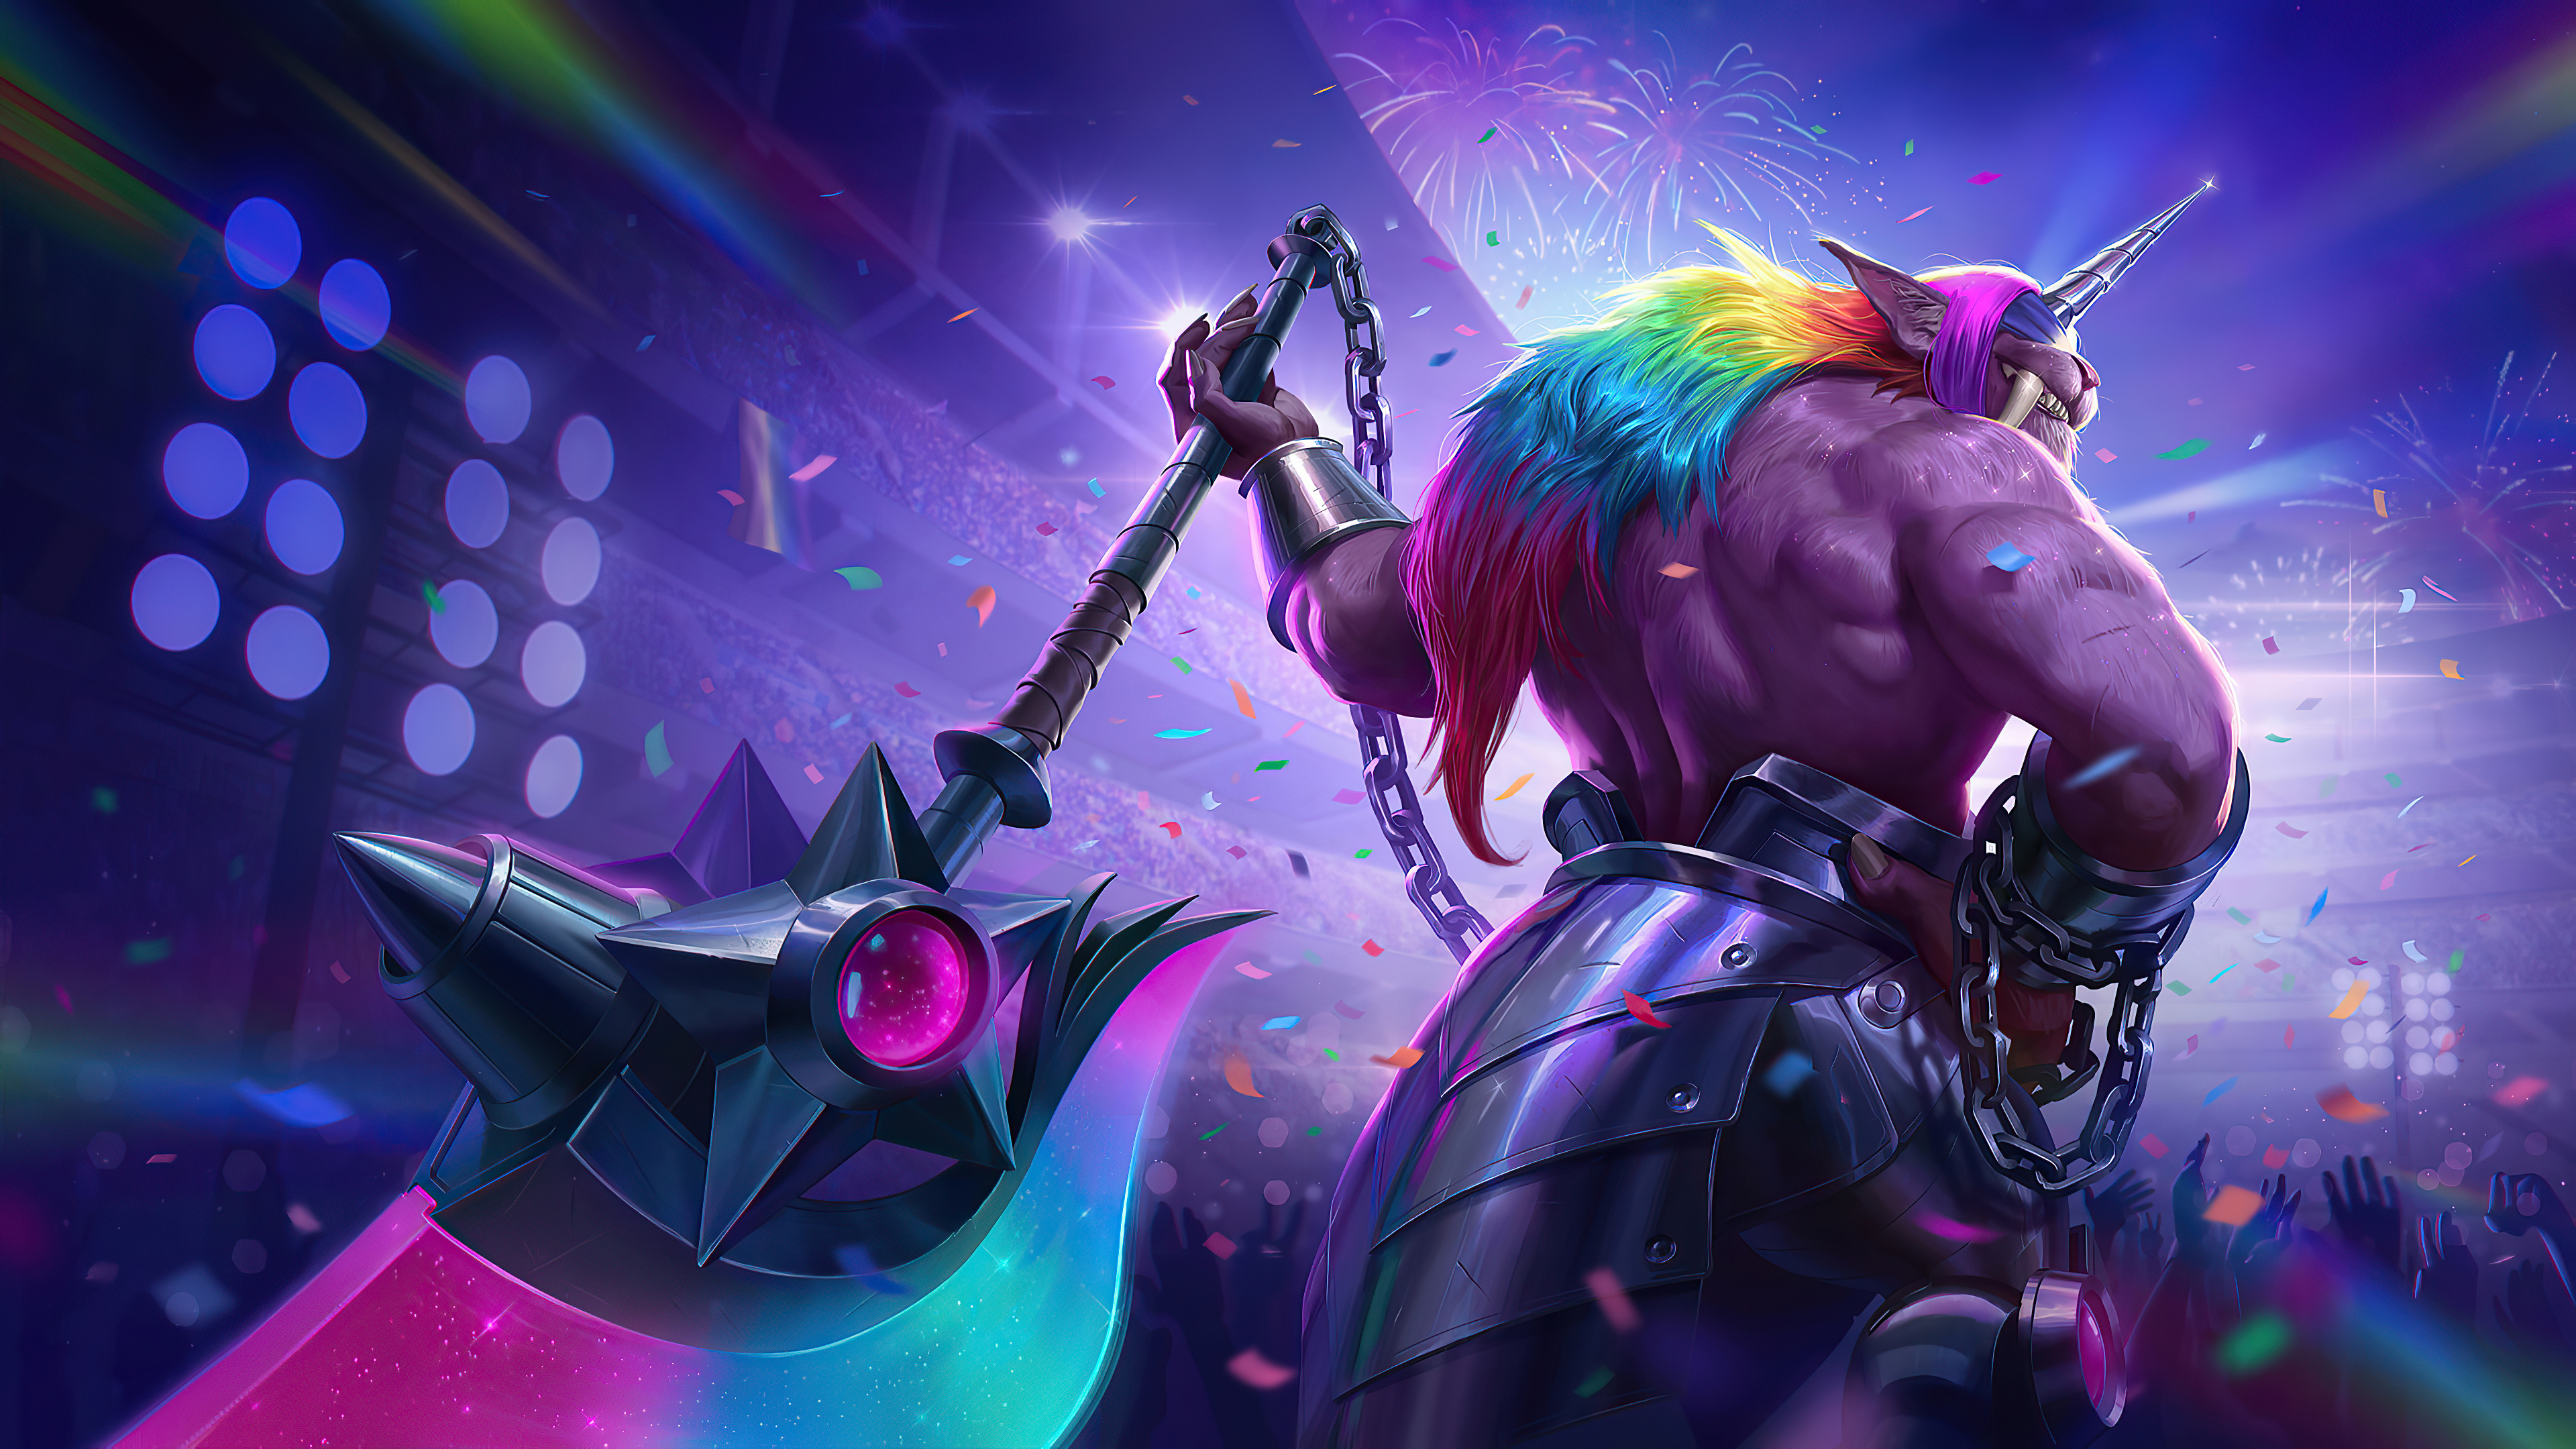 vainglory rainbow glaive 4k 1598657748 - Vainglory Rainbow Glaive 4k -